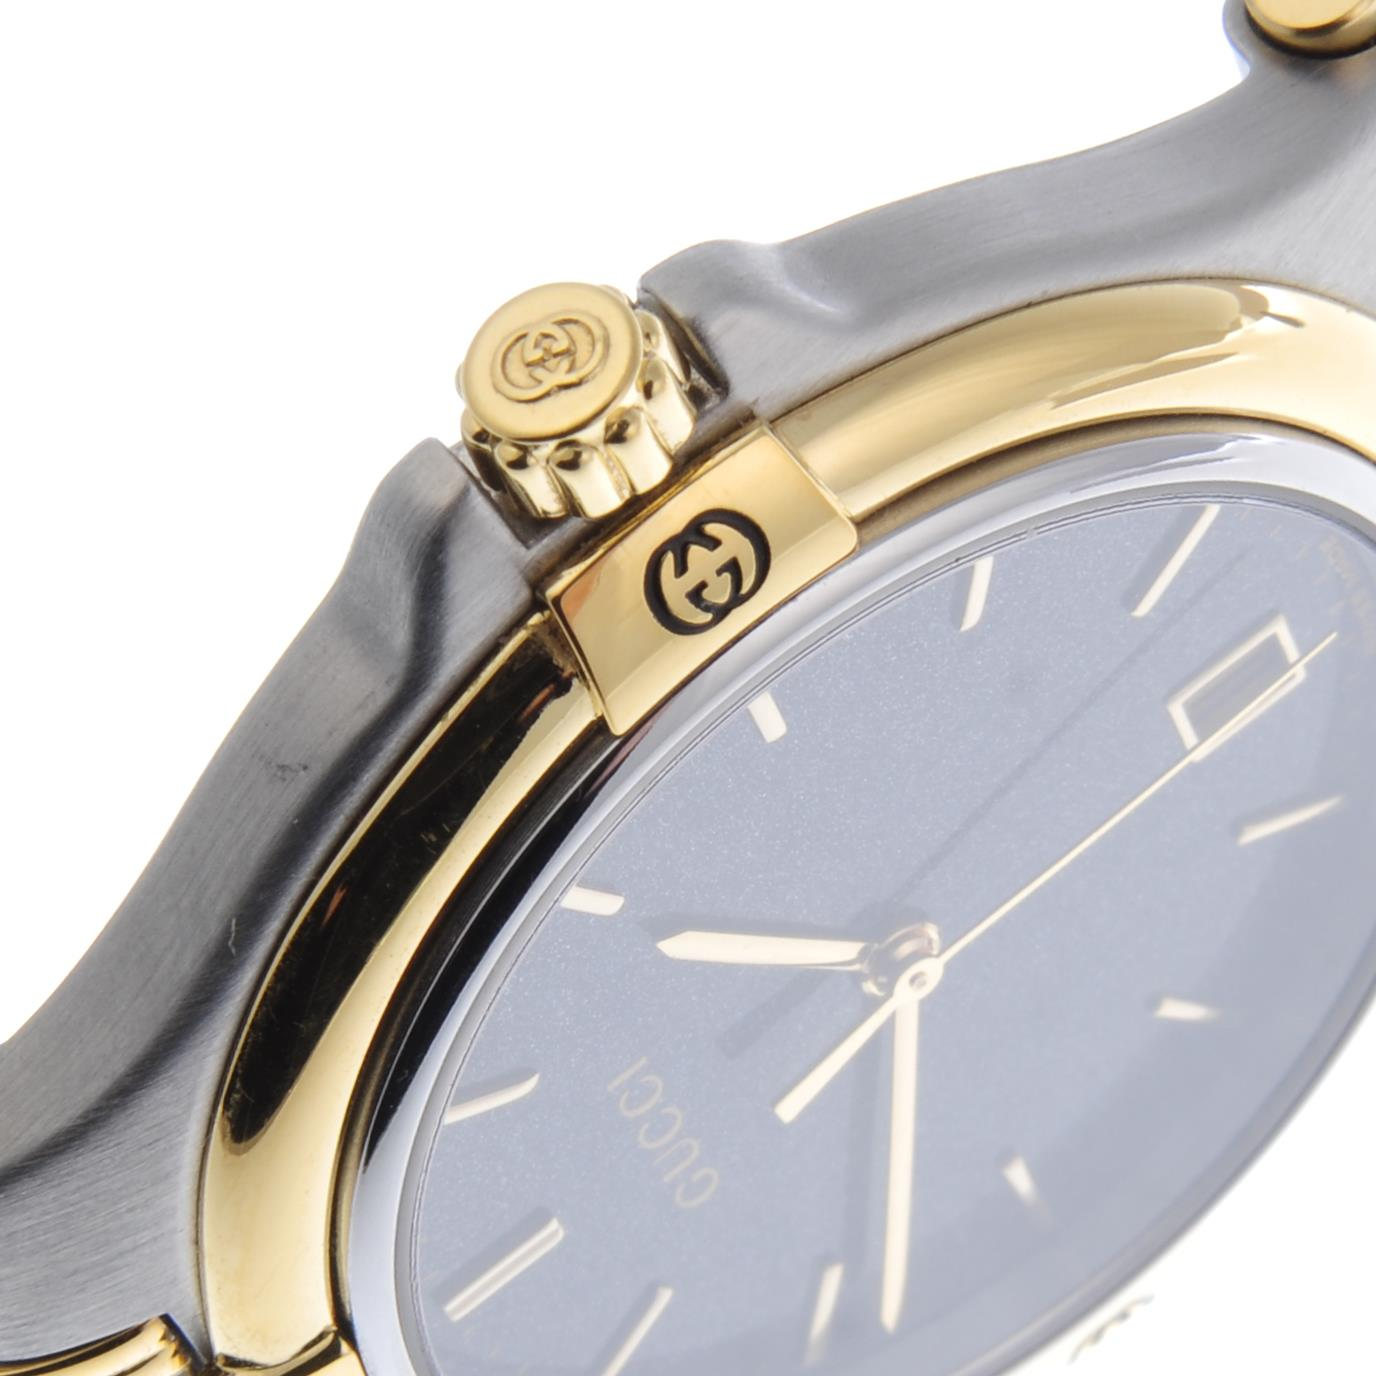 Lot 43 - GUCCI - a gentleman's bracelet watch.